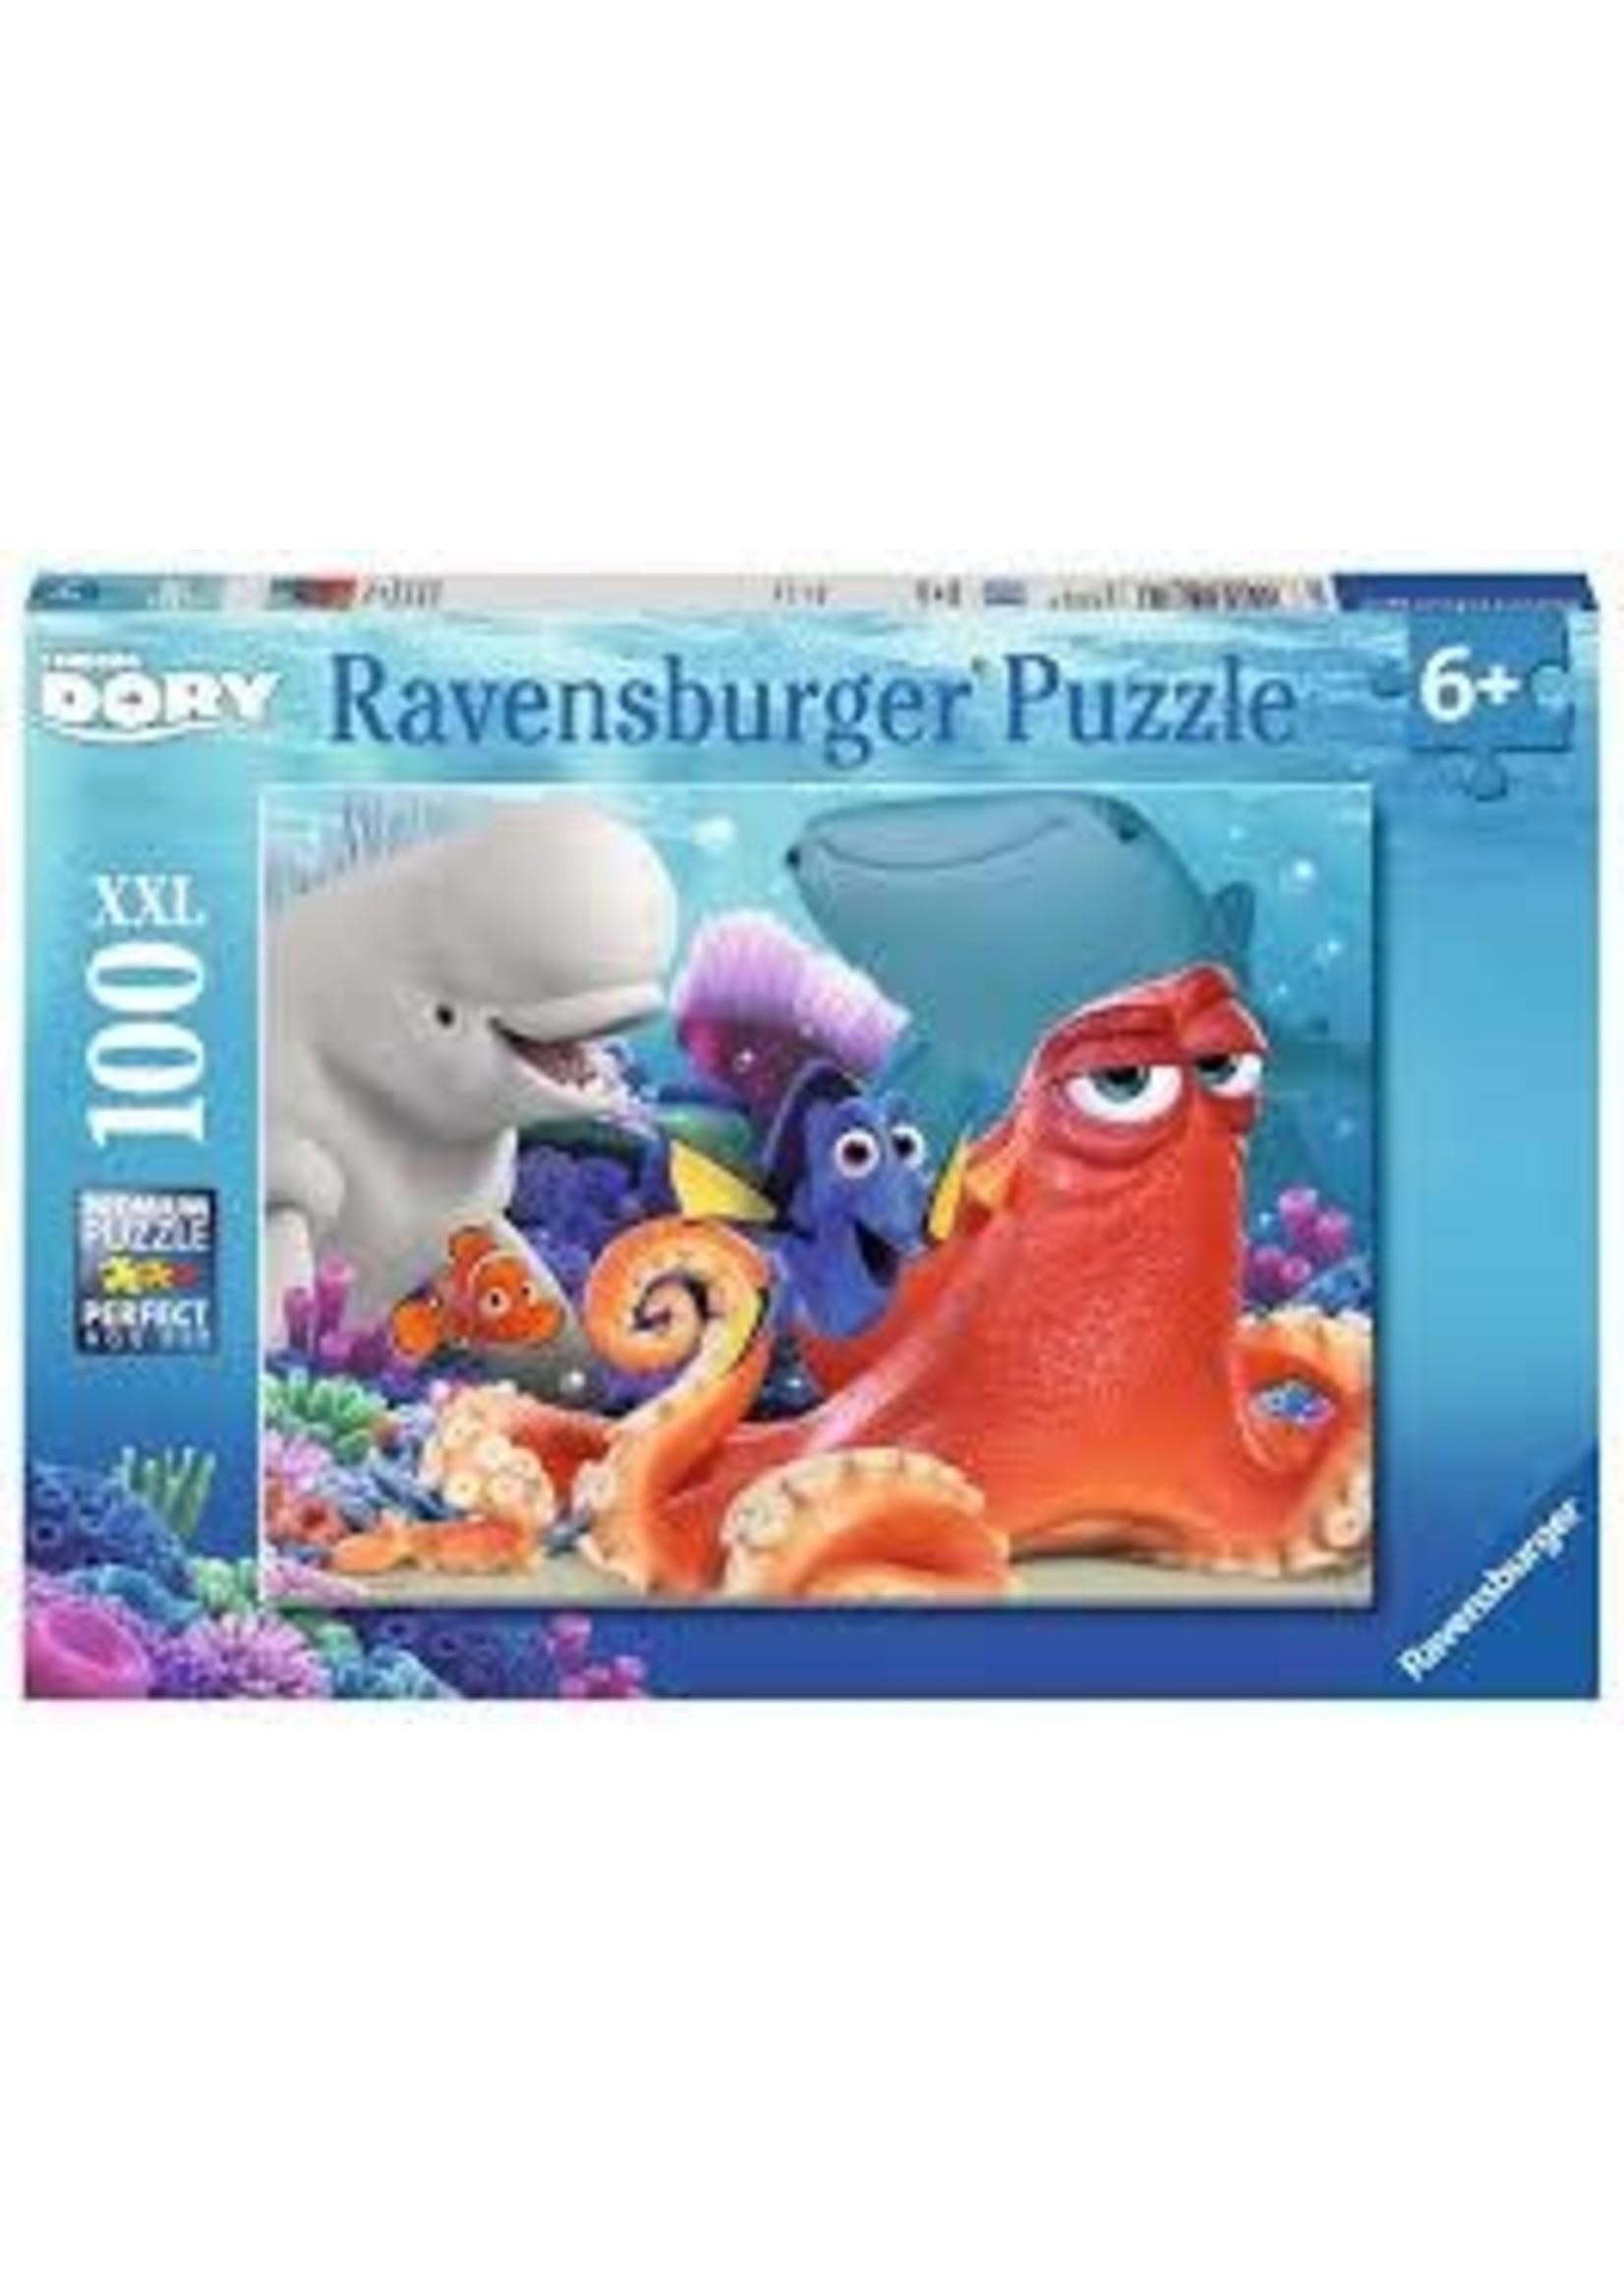 Ravensburger 100pc XXL puzzle Adventure is Brewing